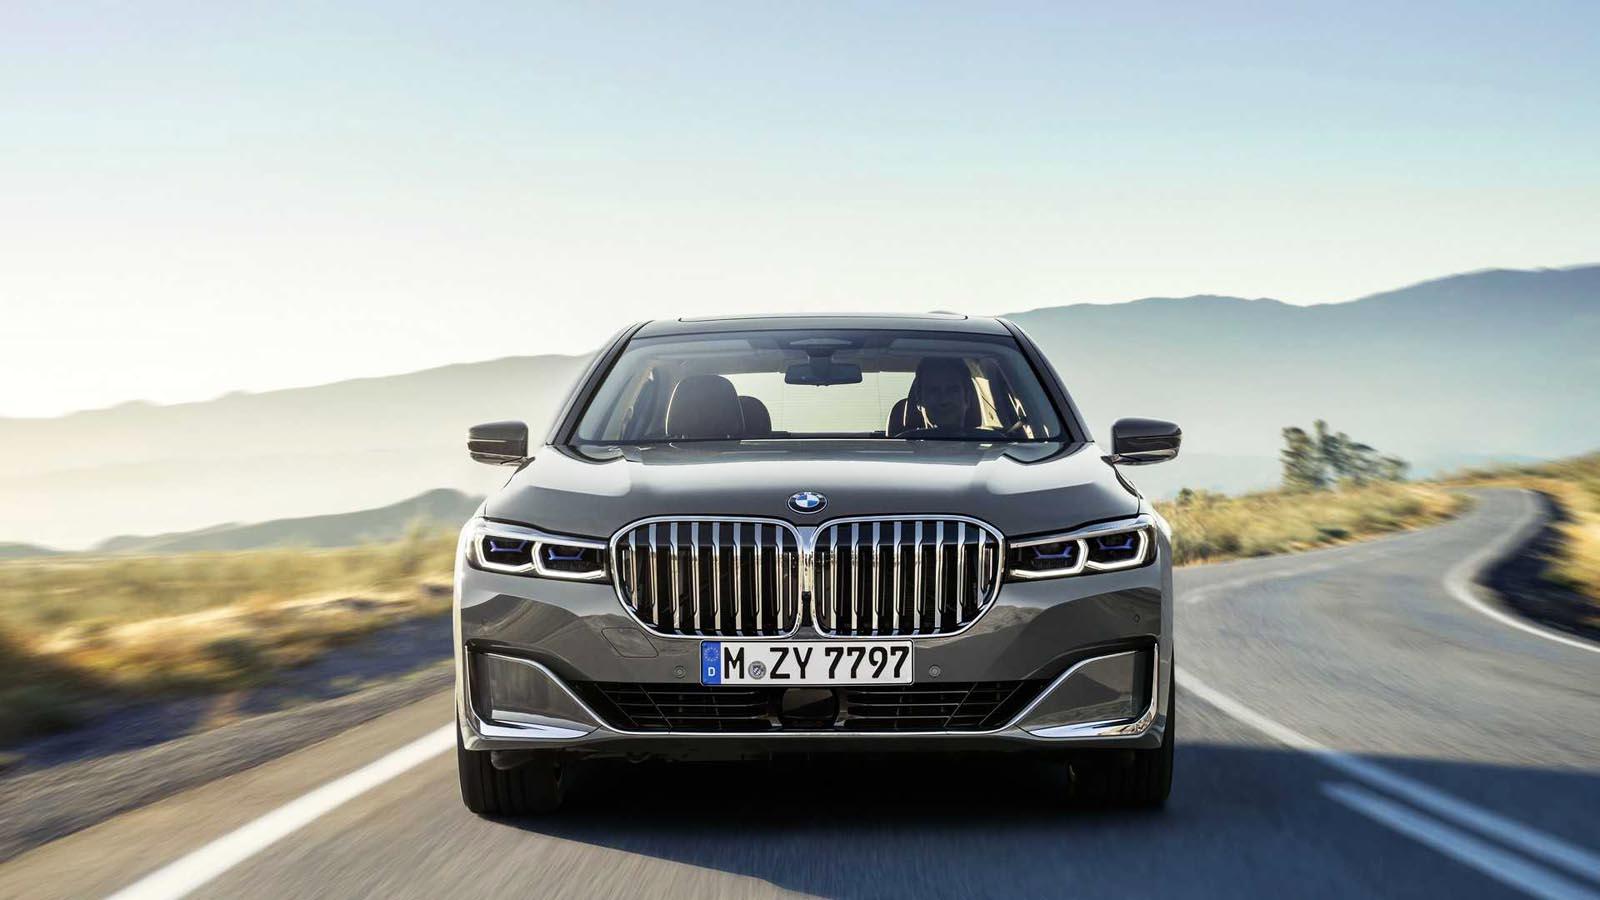 Photo of Νέα BMW 7 με ακόμη μεγαλύτερη μάσκα και νέα V8 έκδοση [vid]